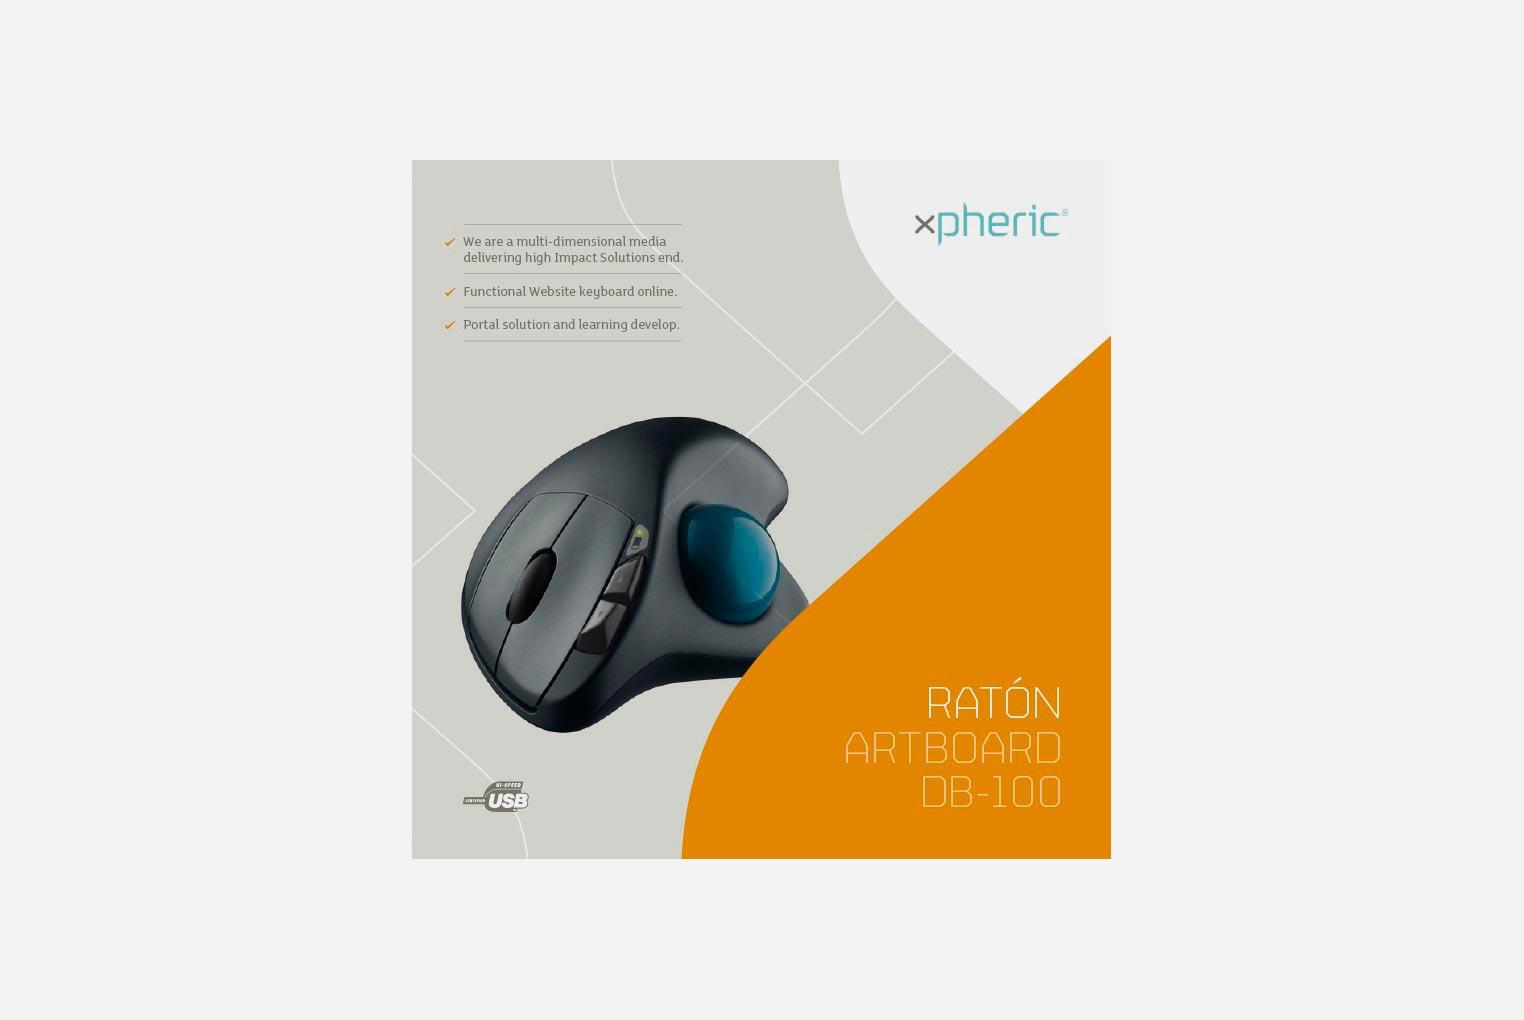 Diseño de packaging ratón xpheric anverso